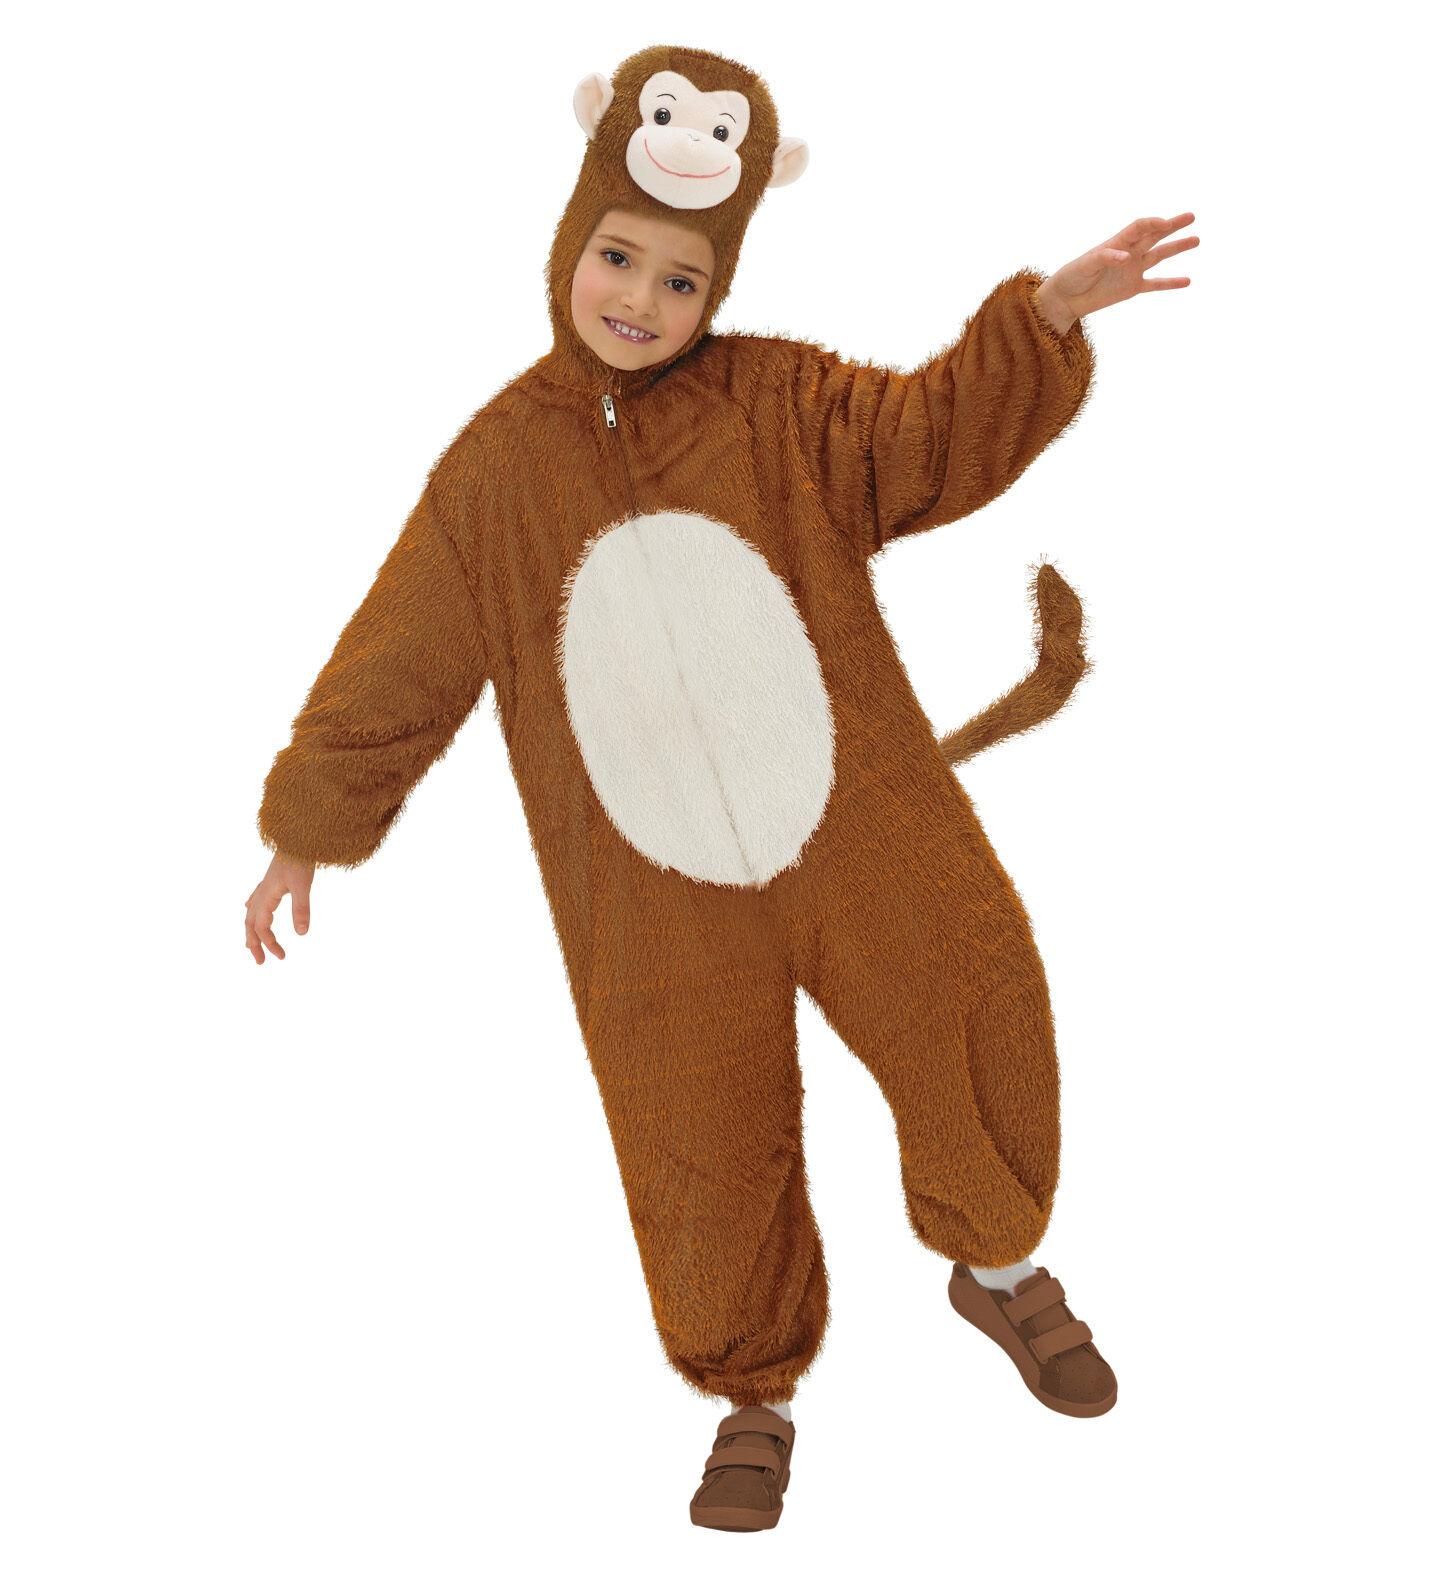 WIM 9778C  Affe Ape Funny Affenkostüm Fasching Karneval Kinder Unisex Kostüm